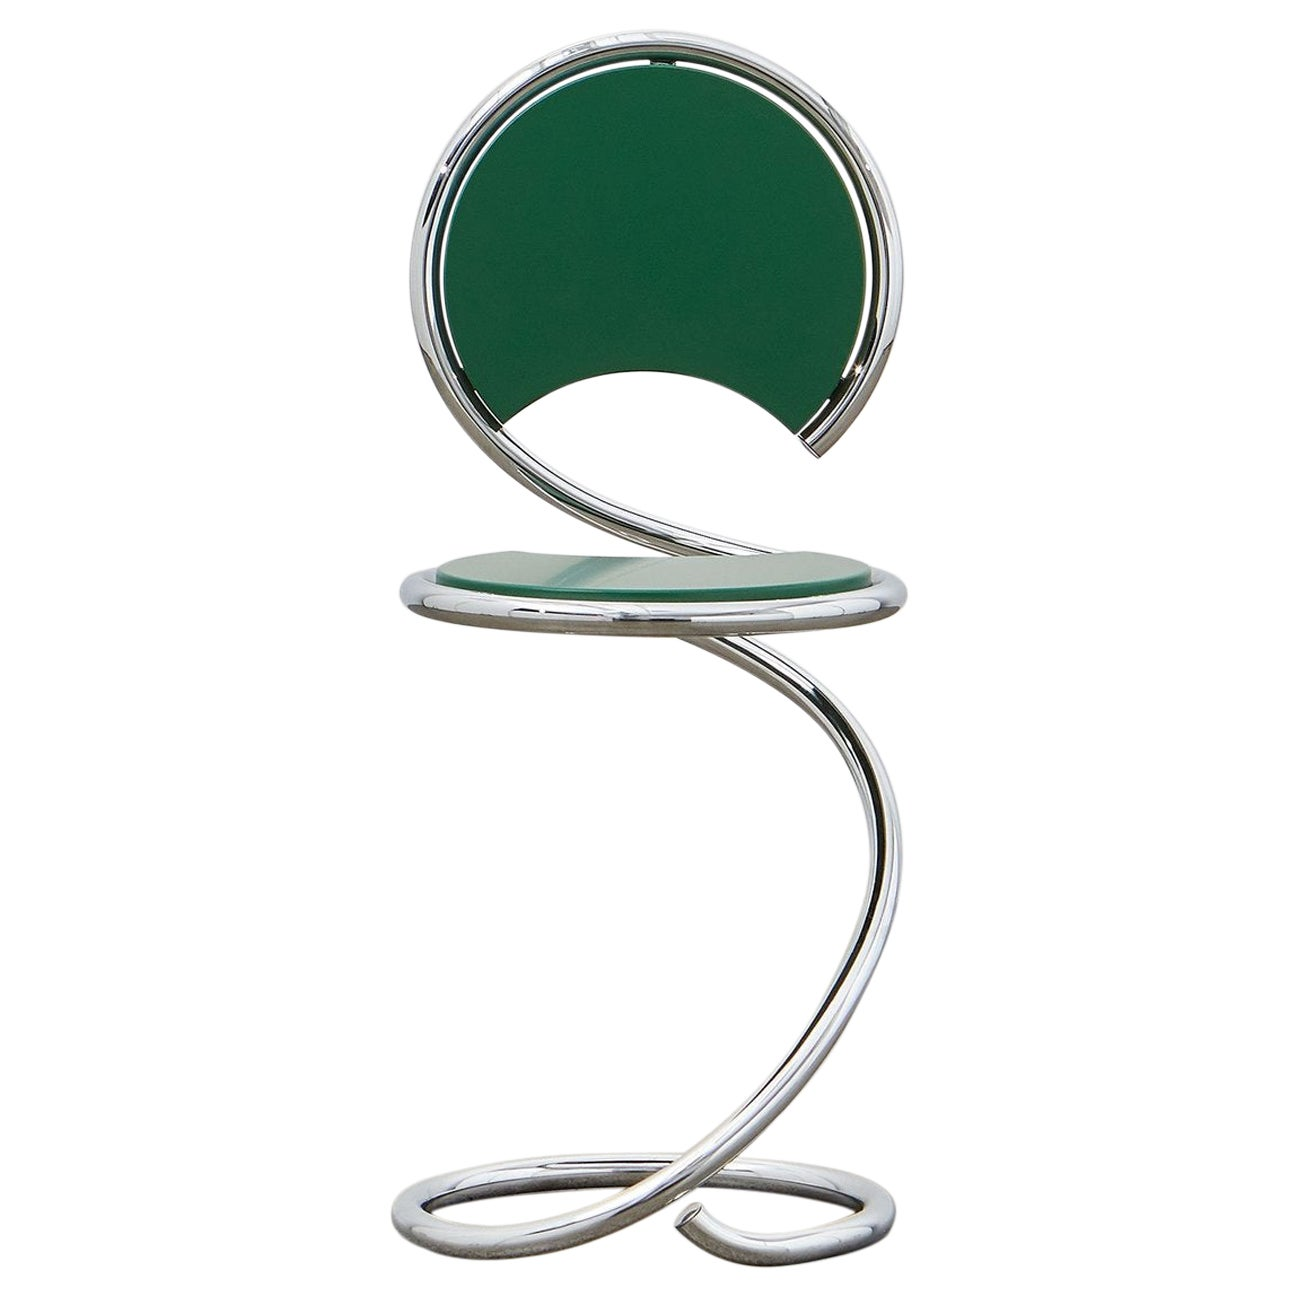 PH Snake Chair, Chrome, Green Painted Satin Matt, Wood Seat/Back, Visible Tubes